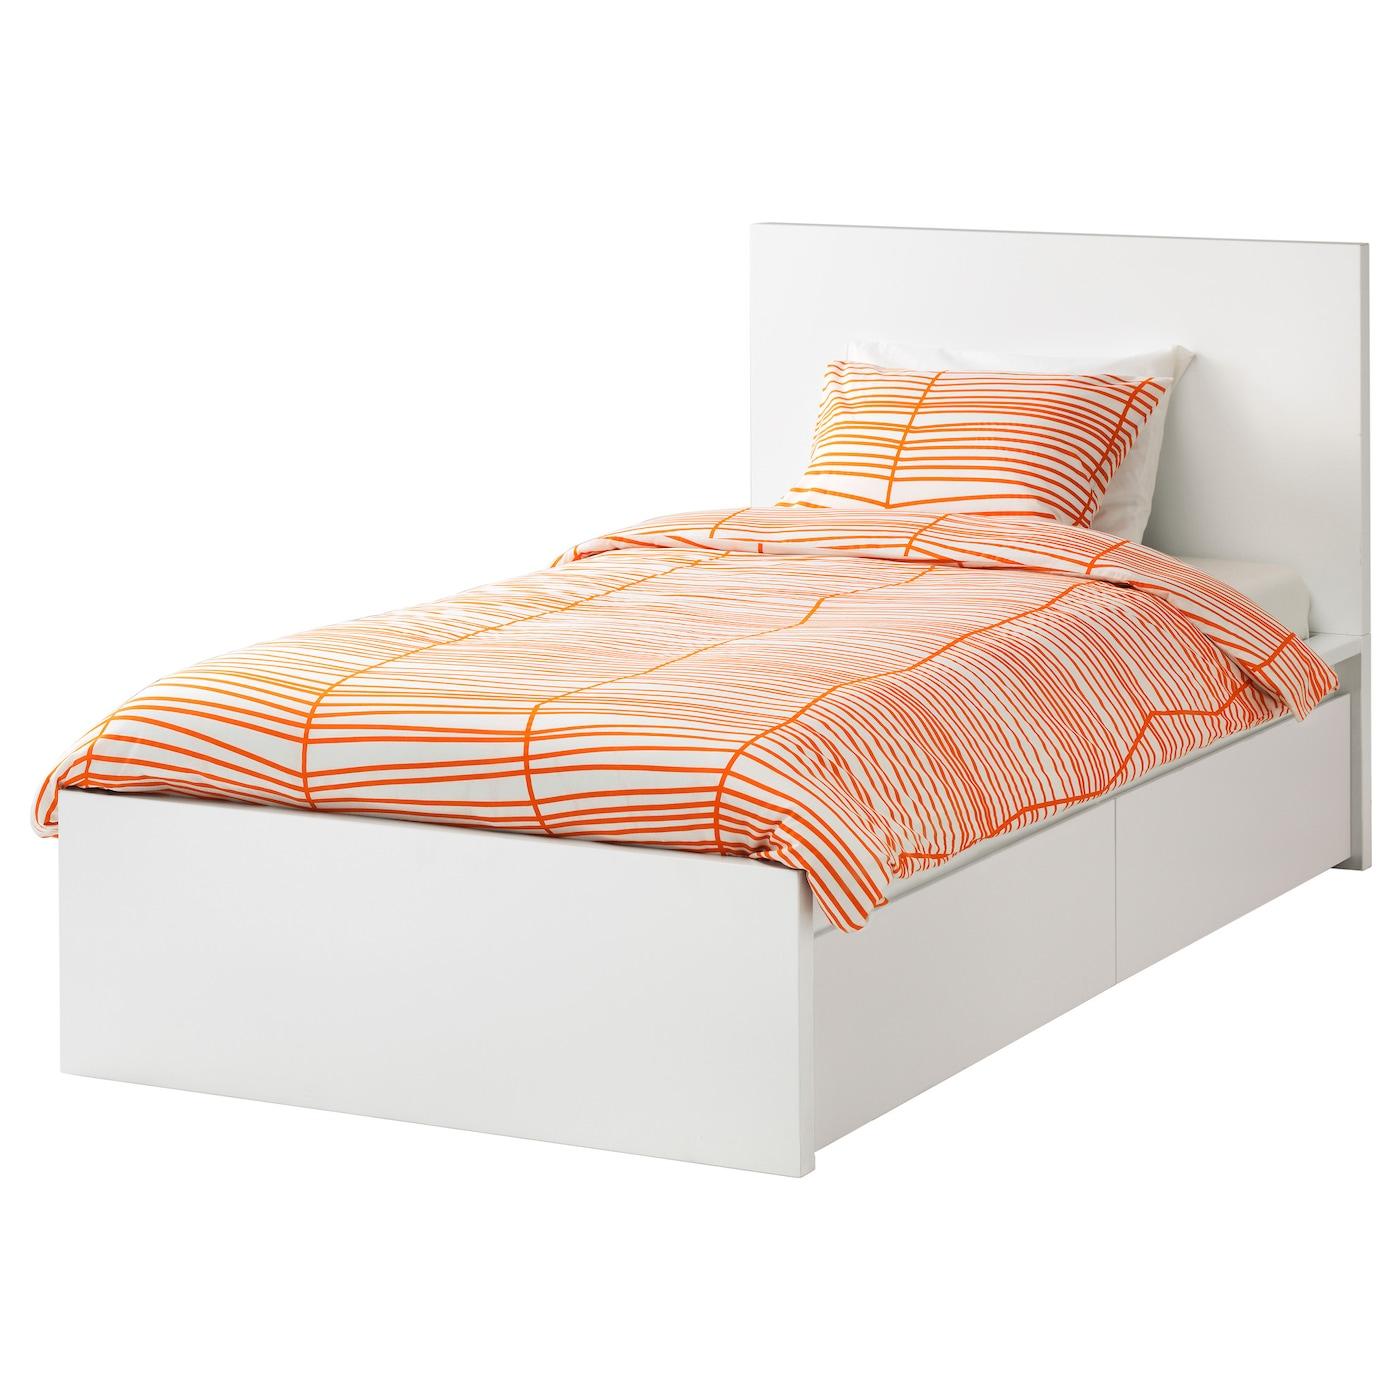 Malm Bed Frame High W 2 Storage Boxes White Lur 246 Y